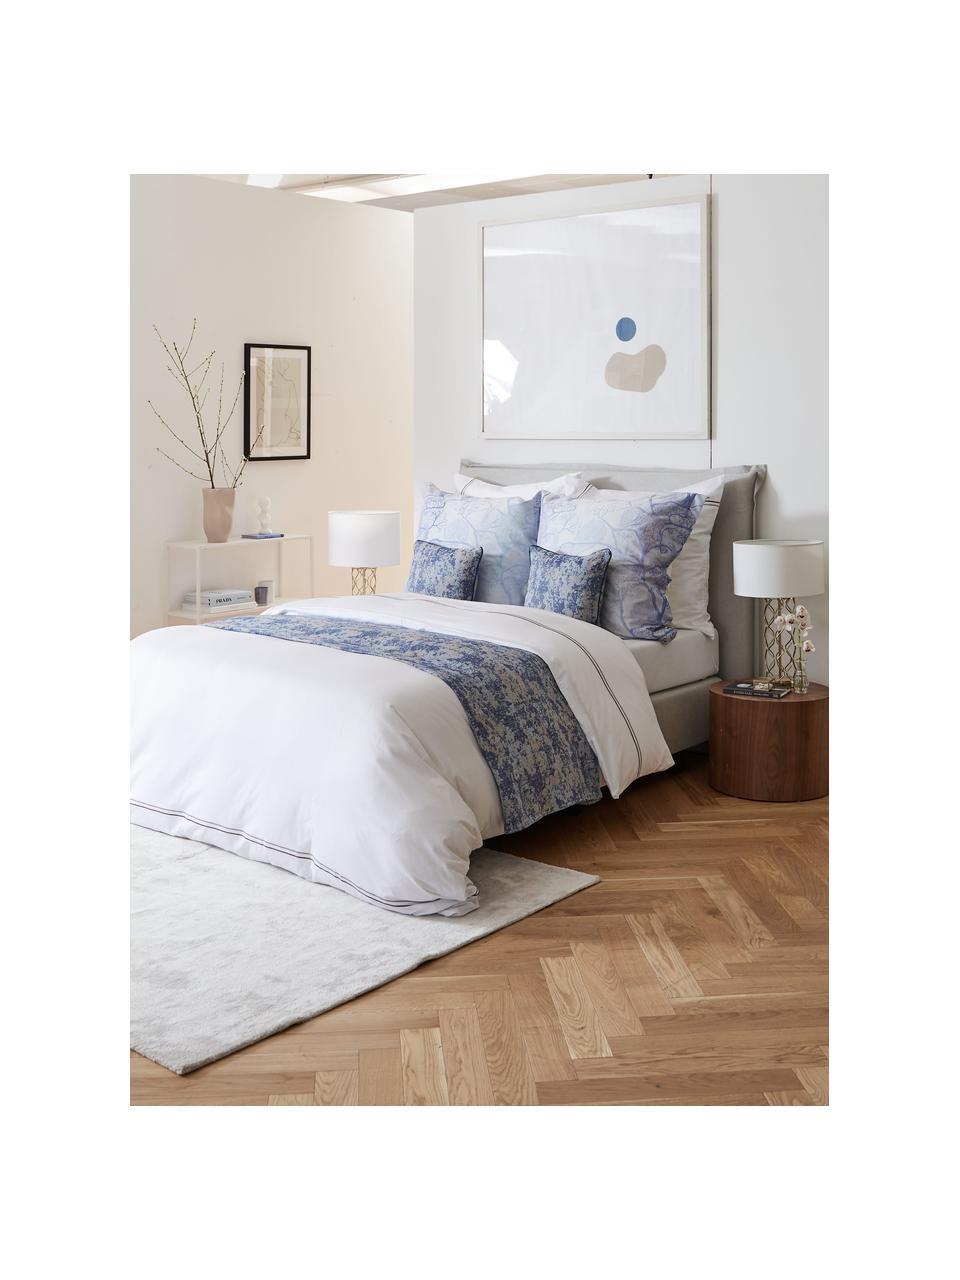 Premium boxspring bed Violet in lichtgrijs, Matras: 5-zones pocketvering, Poten: massief gelakt berkenhout, Geweven stof lichtgrijs, 180 x 200 cm